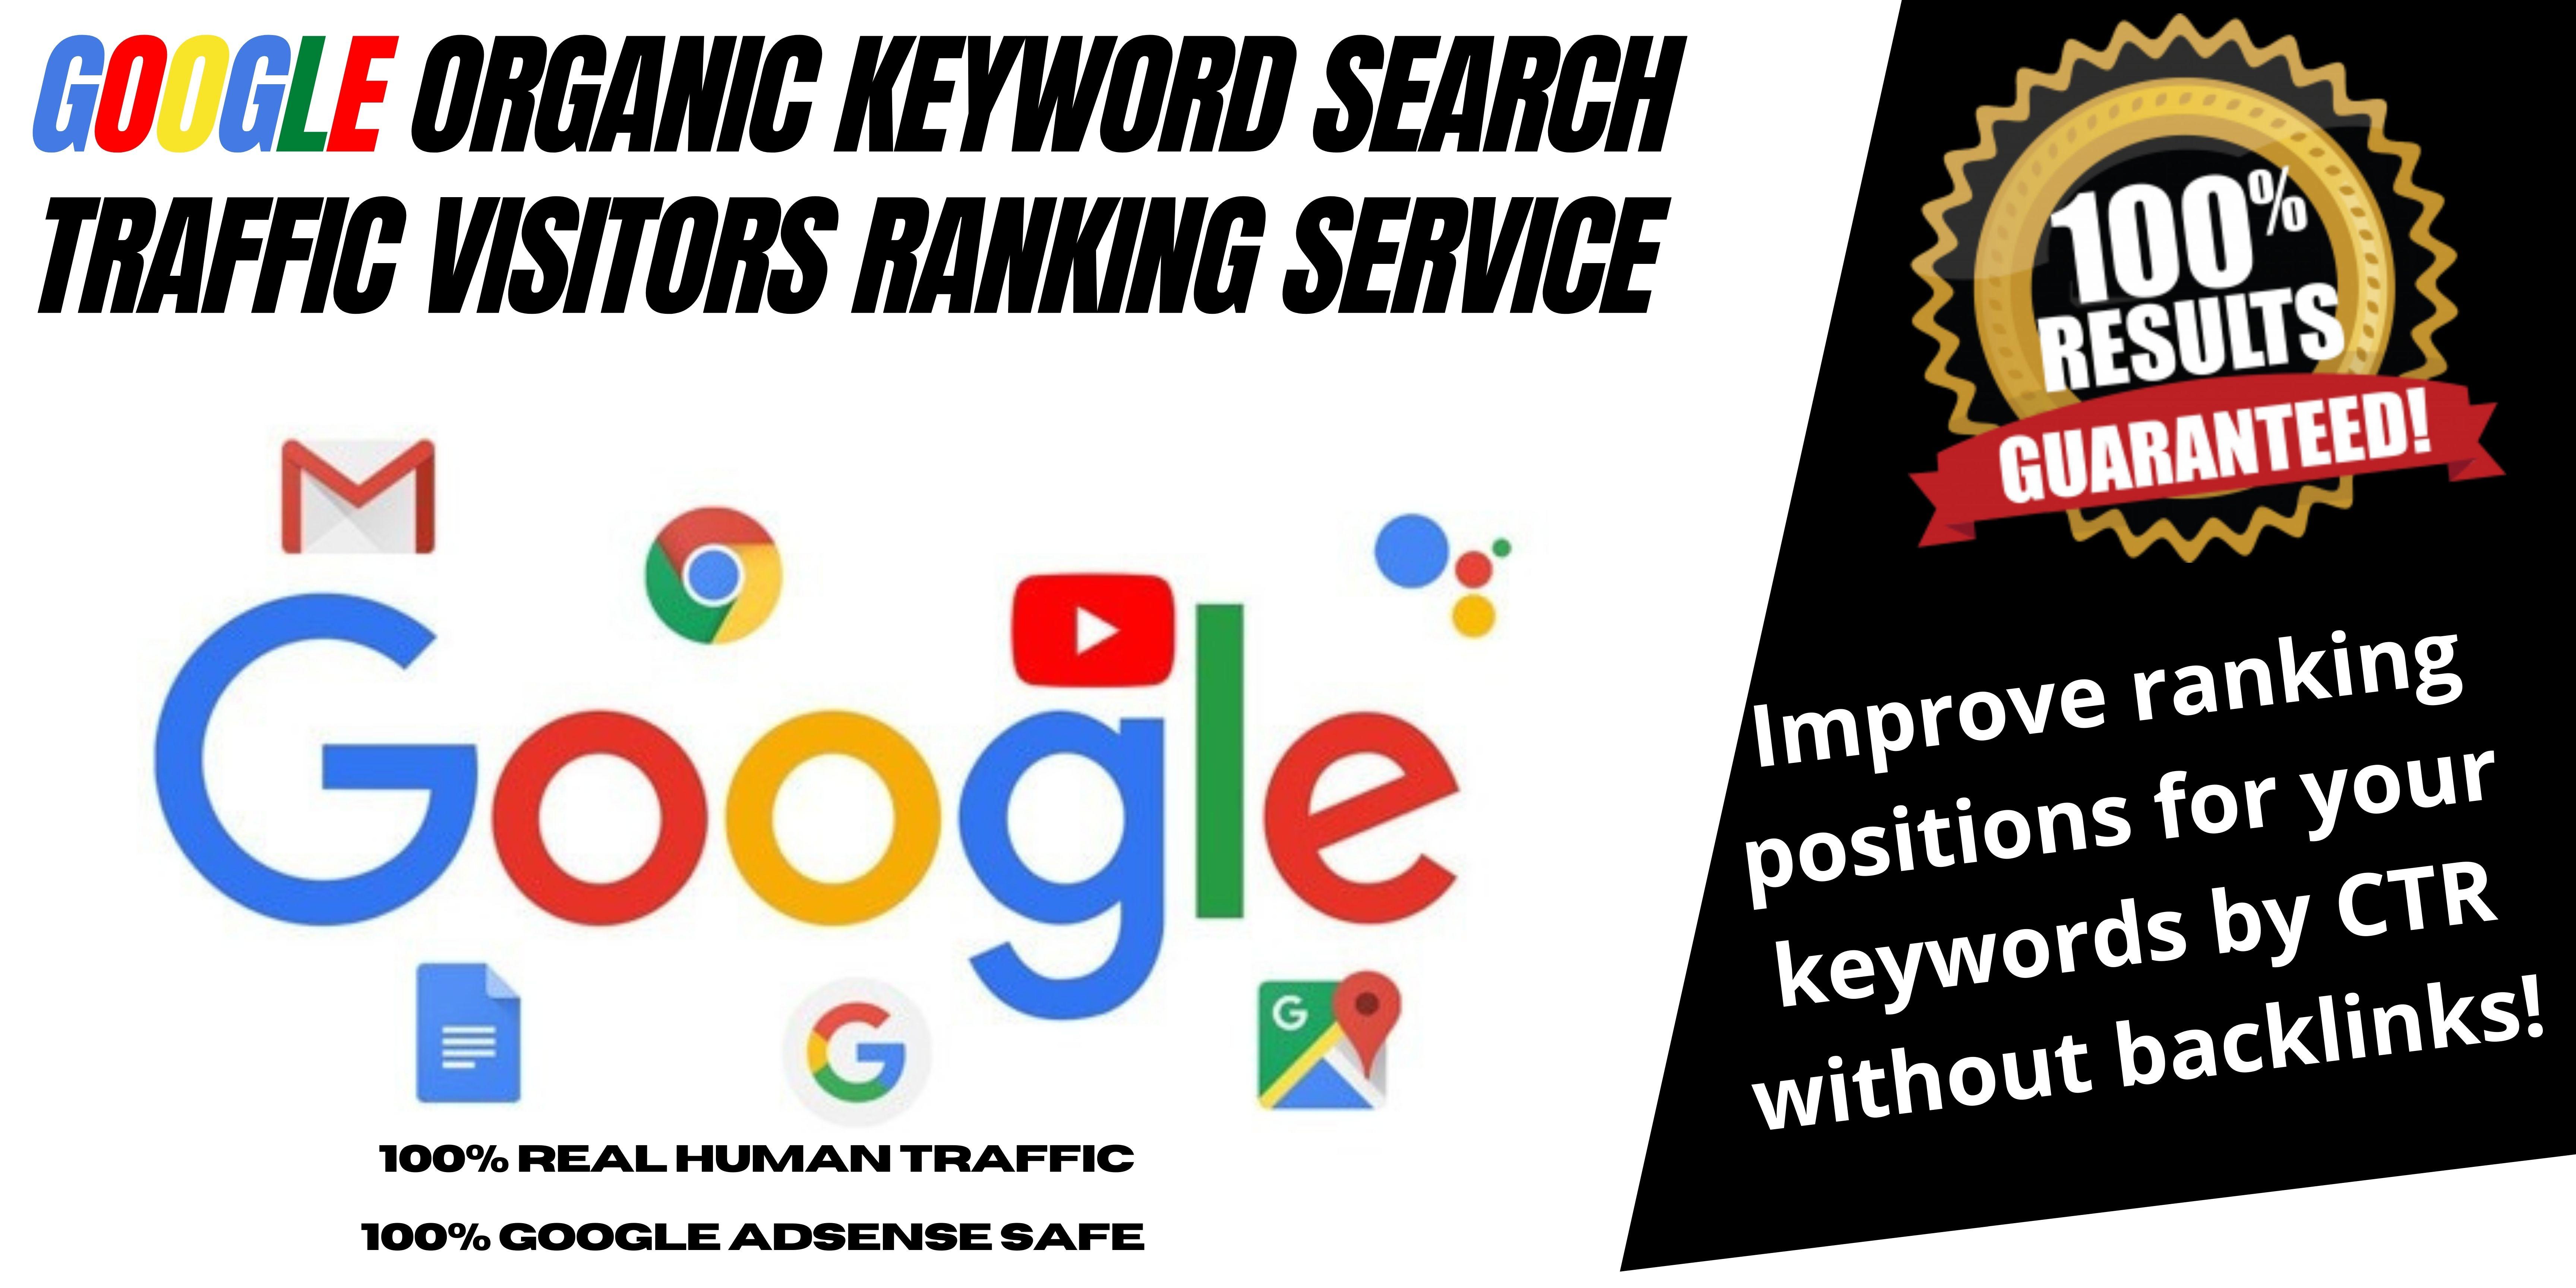 Google Keyword Targeted Website Traffic Visitors Organic SERP Ranking Service